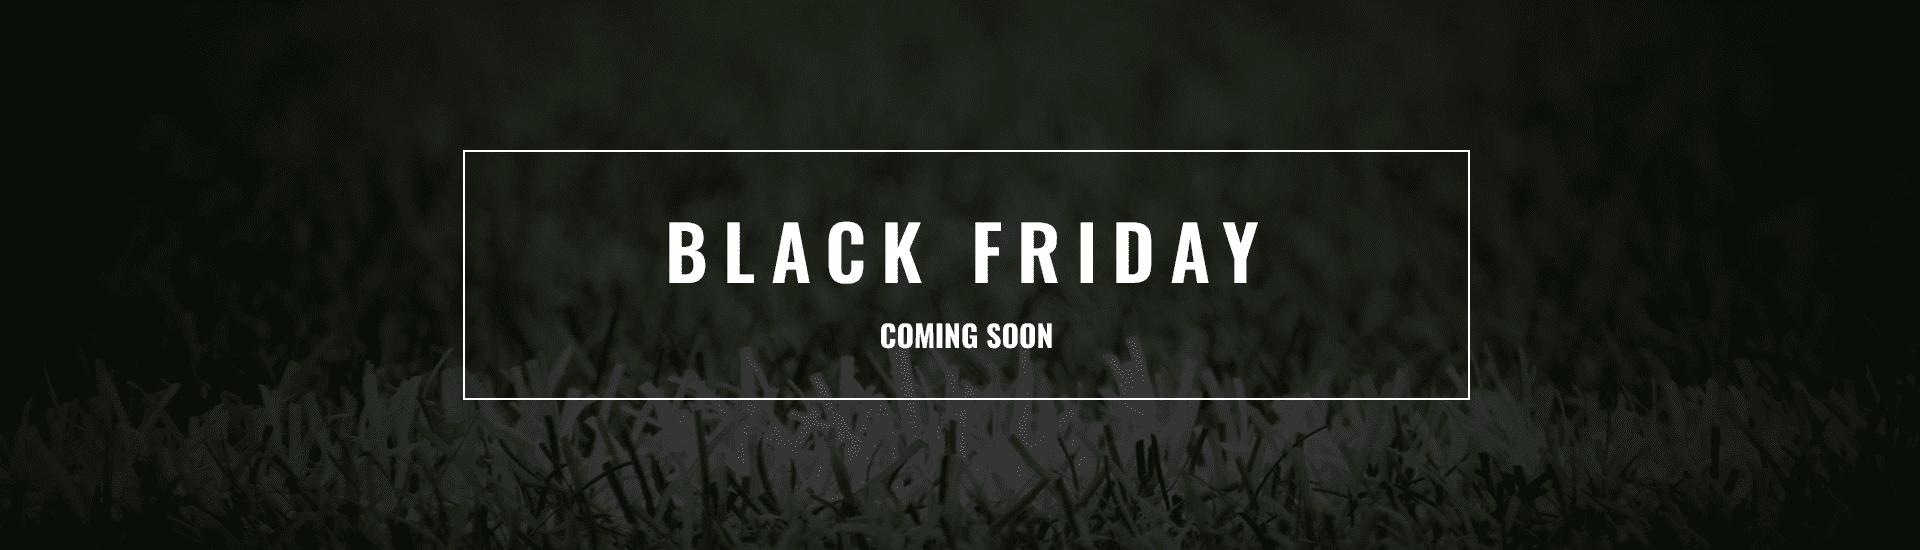 Black Friday Coming Soon